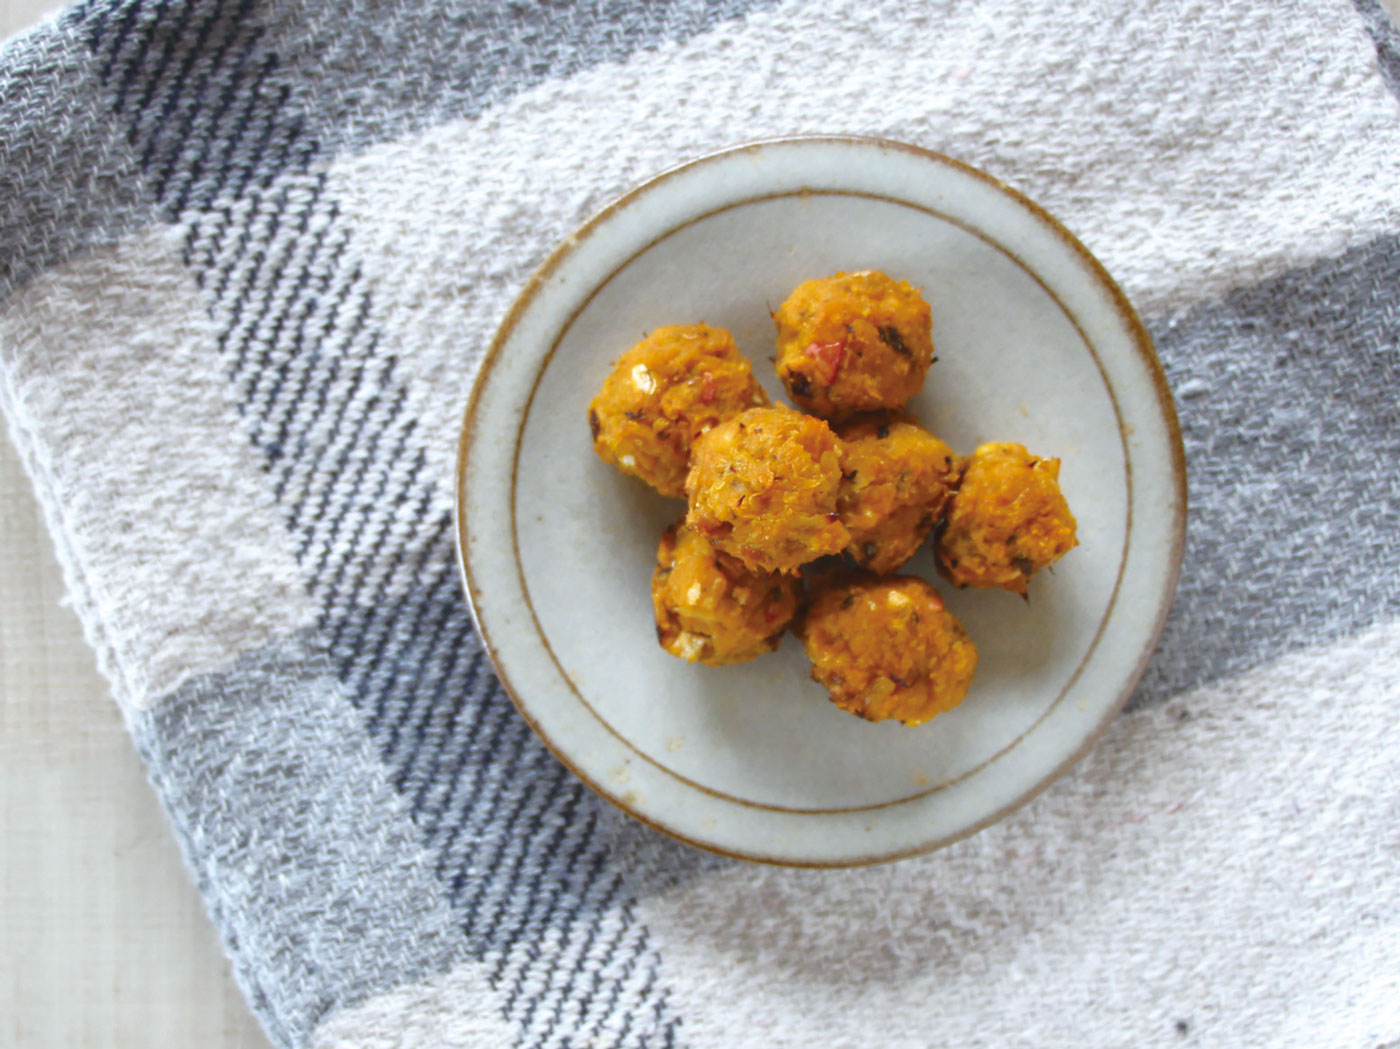 mogcookのお魚離乳食レシピ 魚とかぼちゃのコロコロ海苔ボール